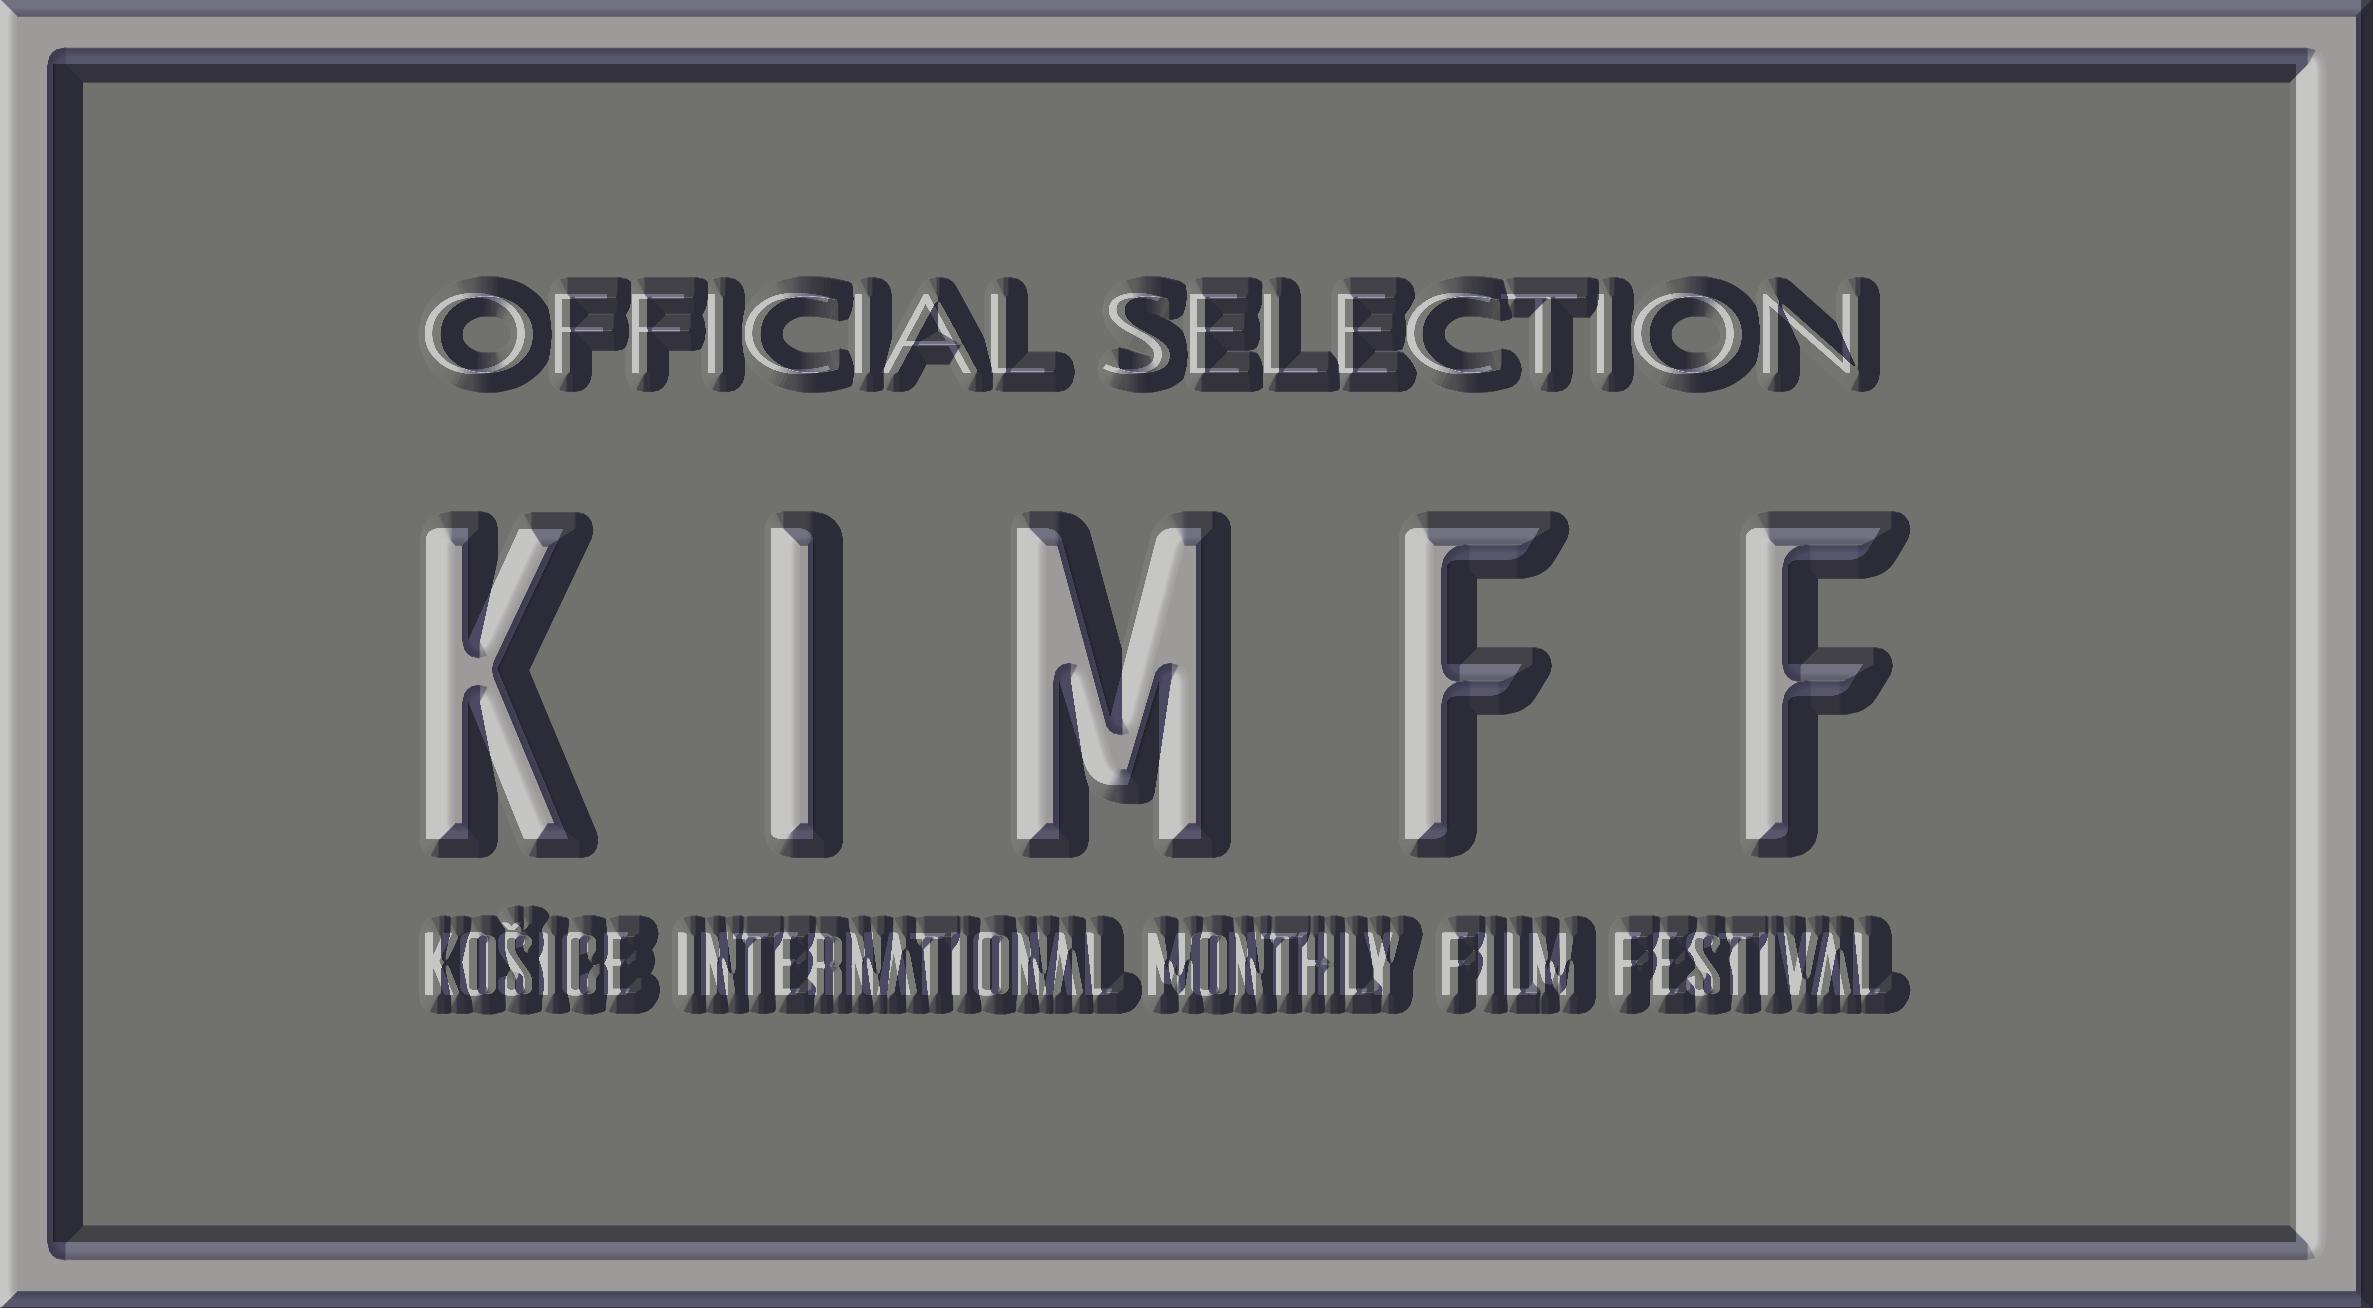 KIMFF 2020